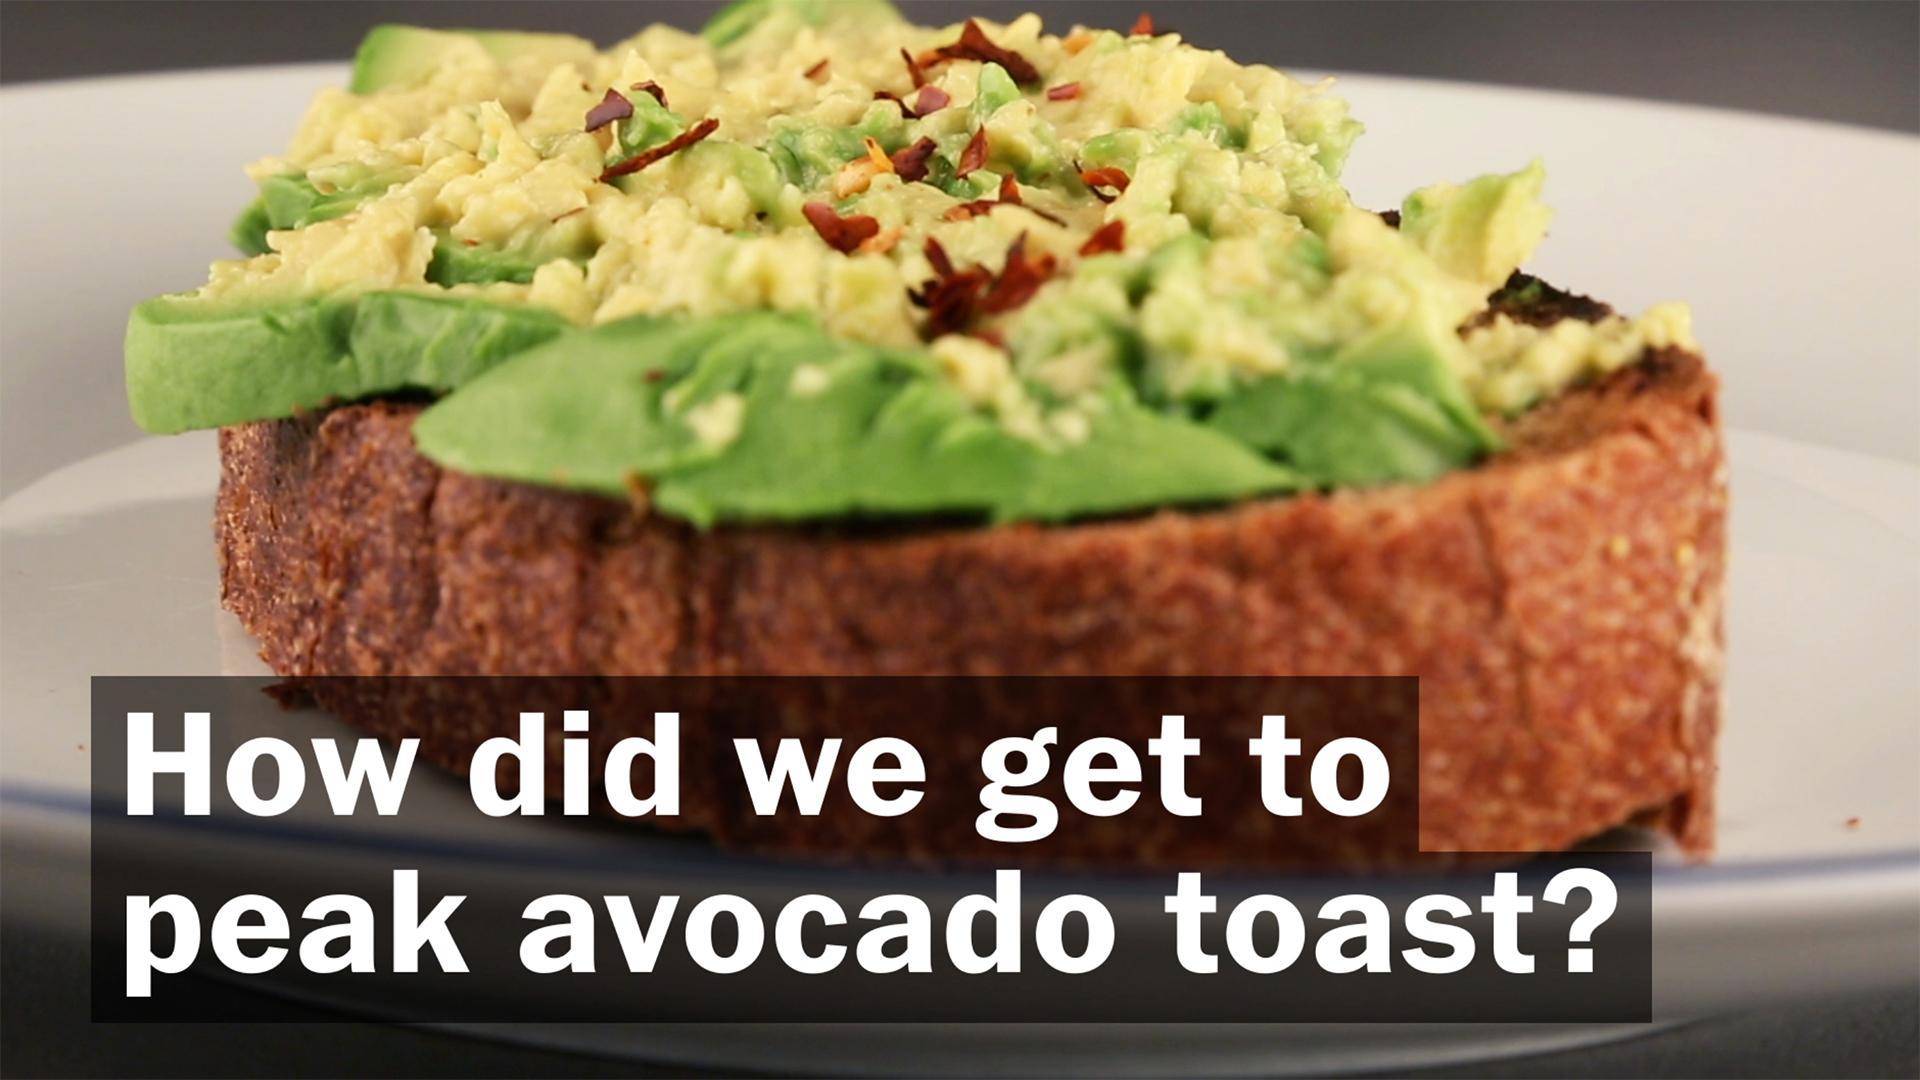 How Did We Get to Peak Avocado Toast?